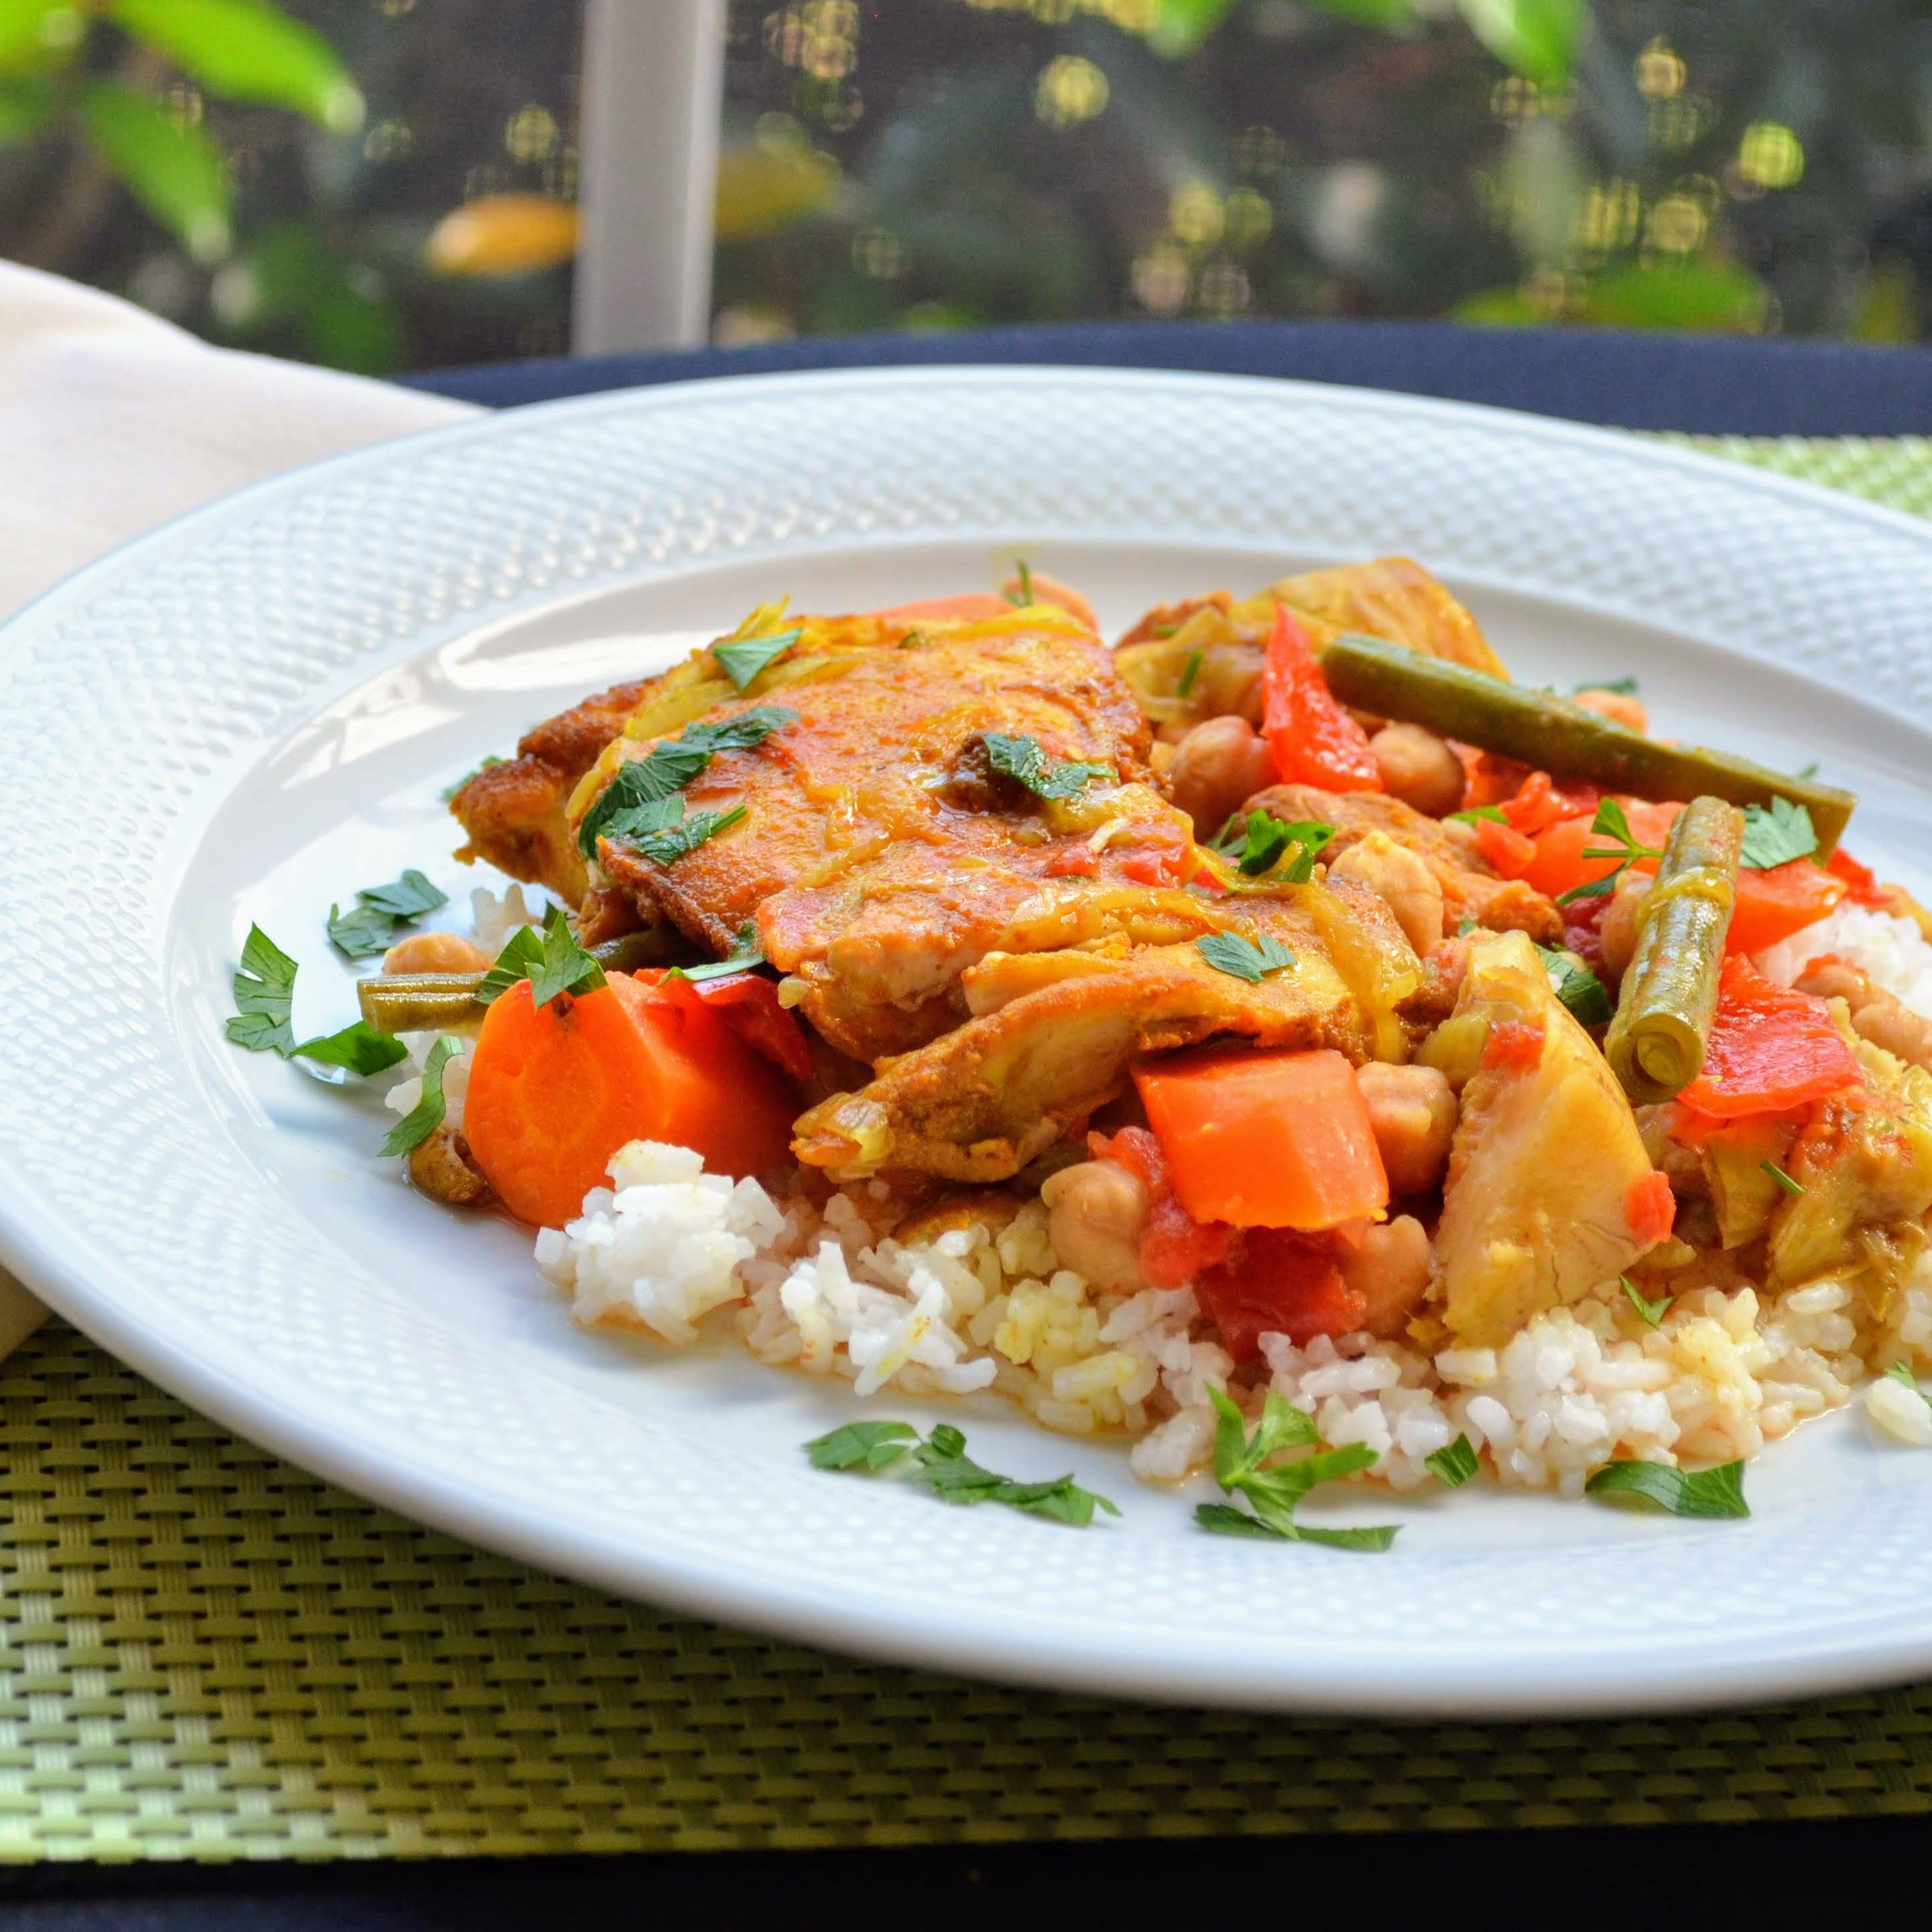 Slow Cooker Mediterranean Chicken and Vegetables